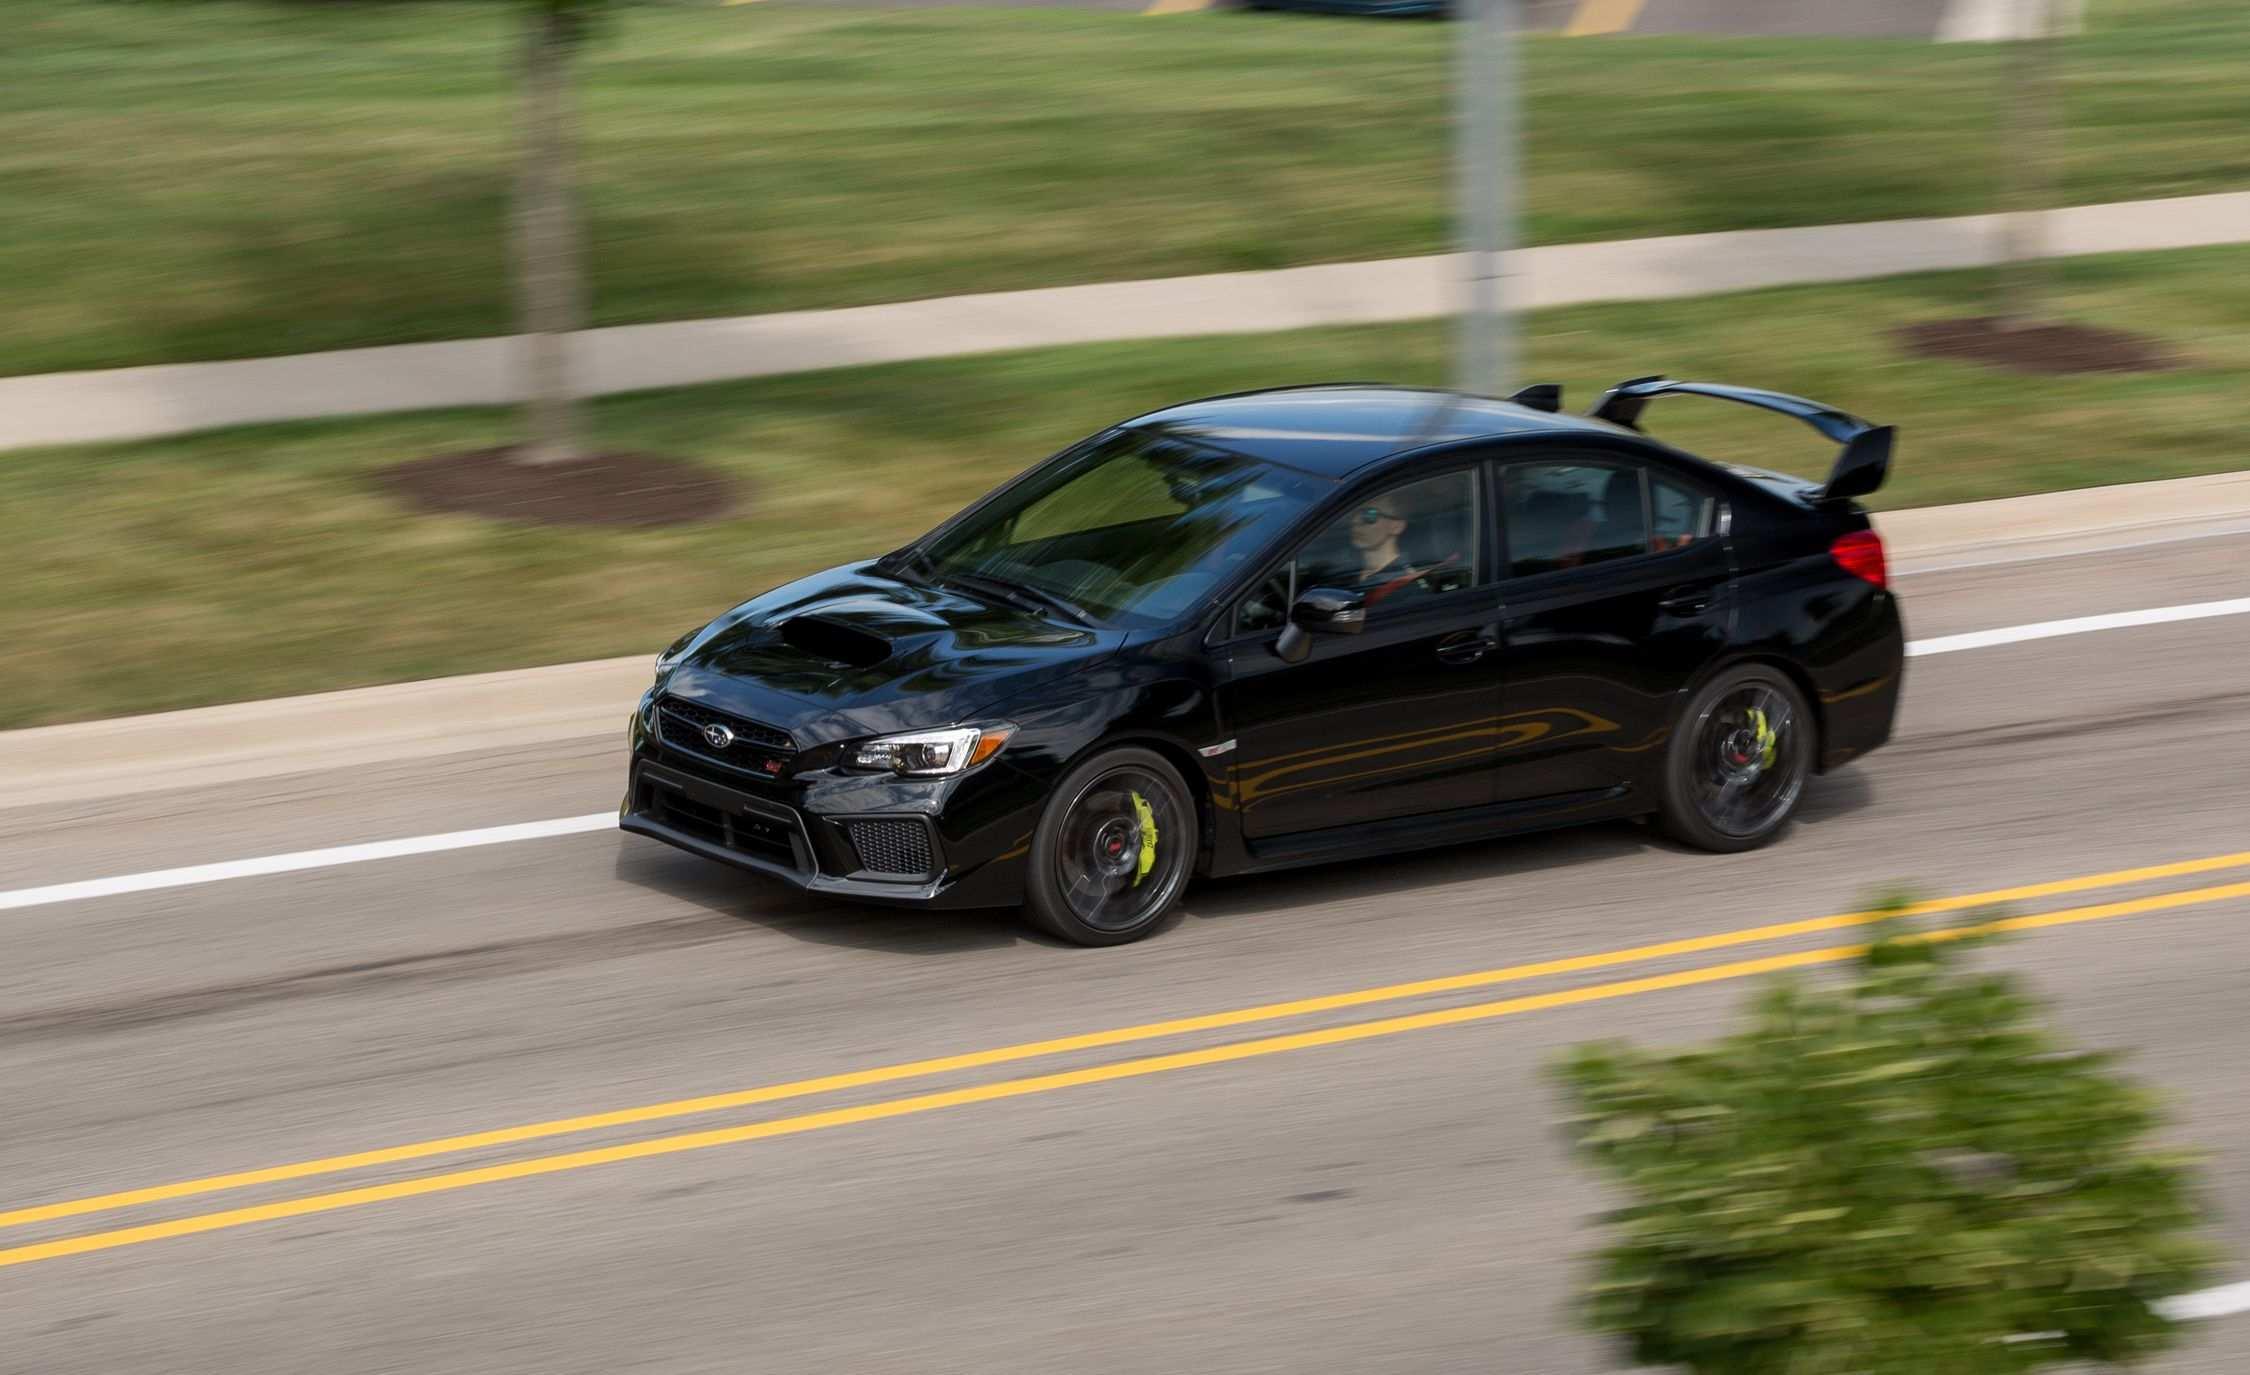 11 All New Subaru Impreza Sti 2019 Review Ratings with Subaru Impreza Sti 2019 Review